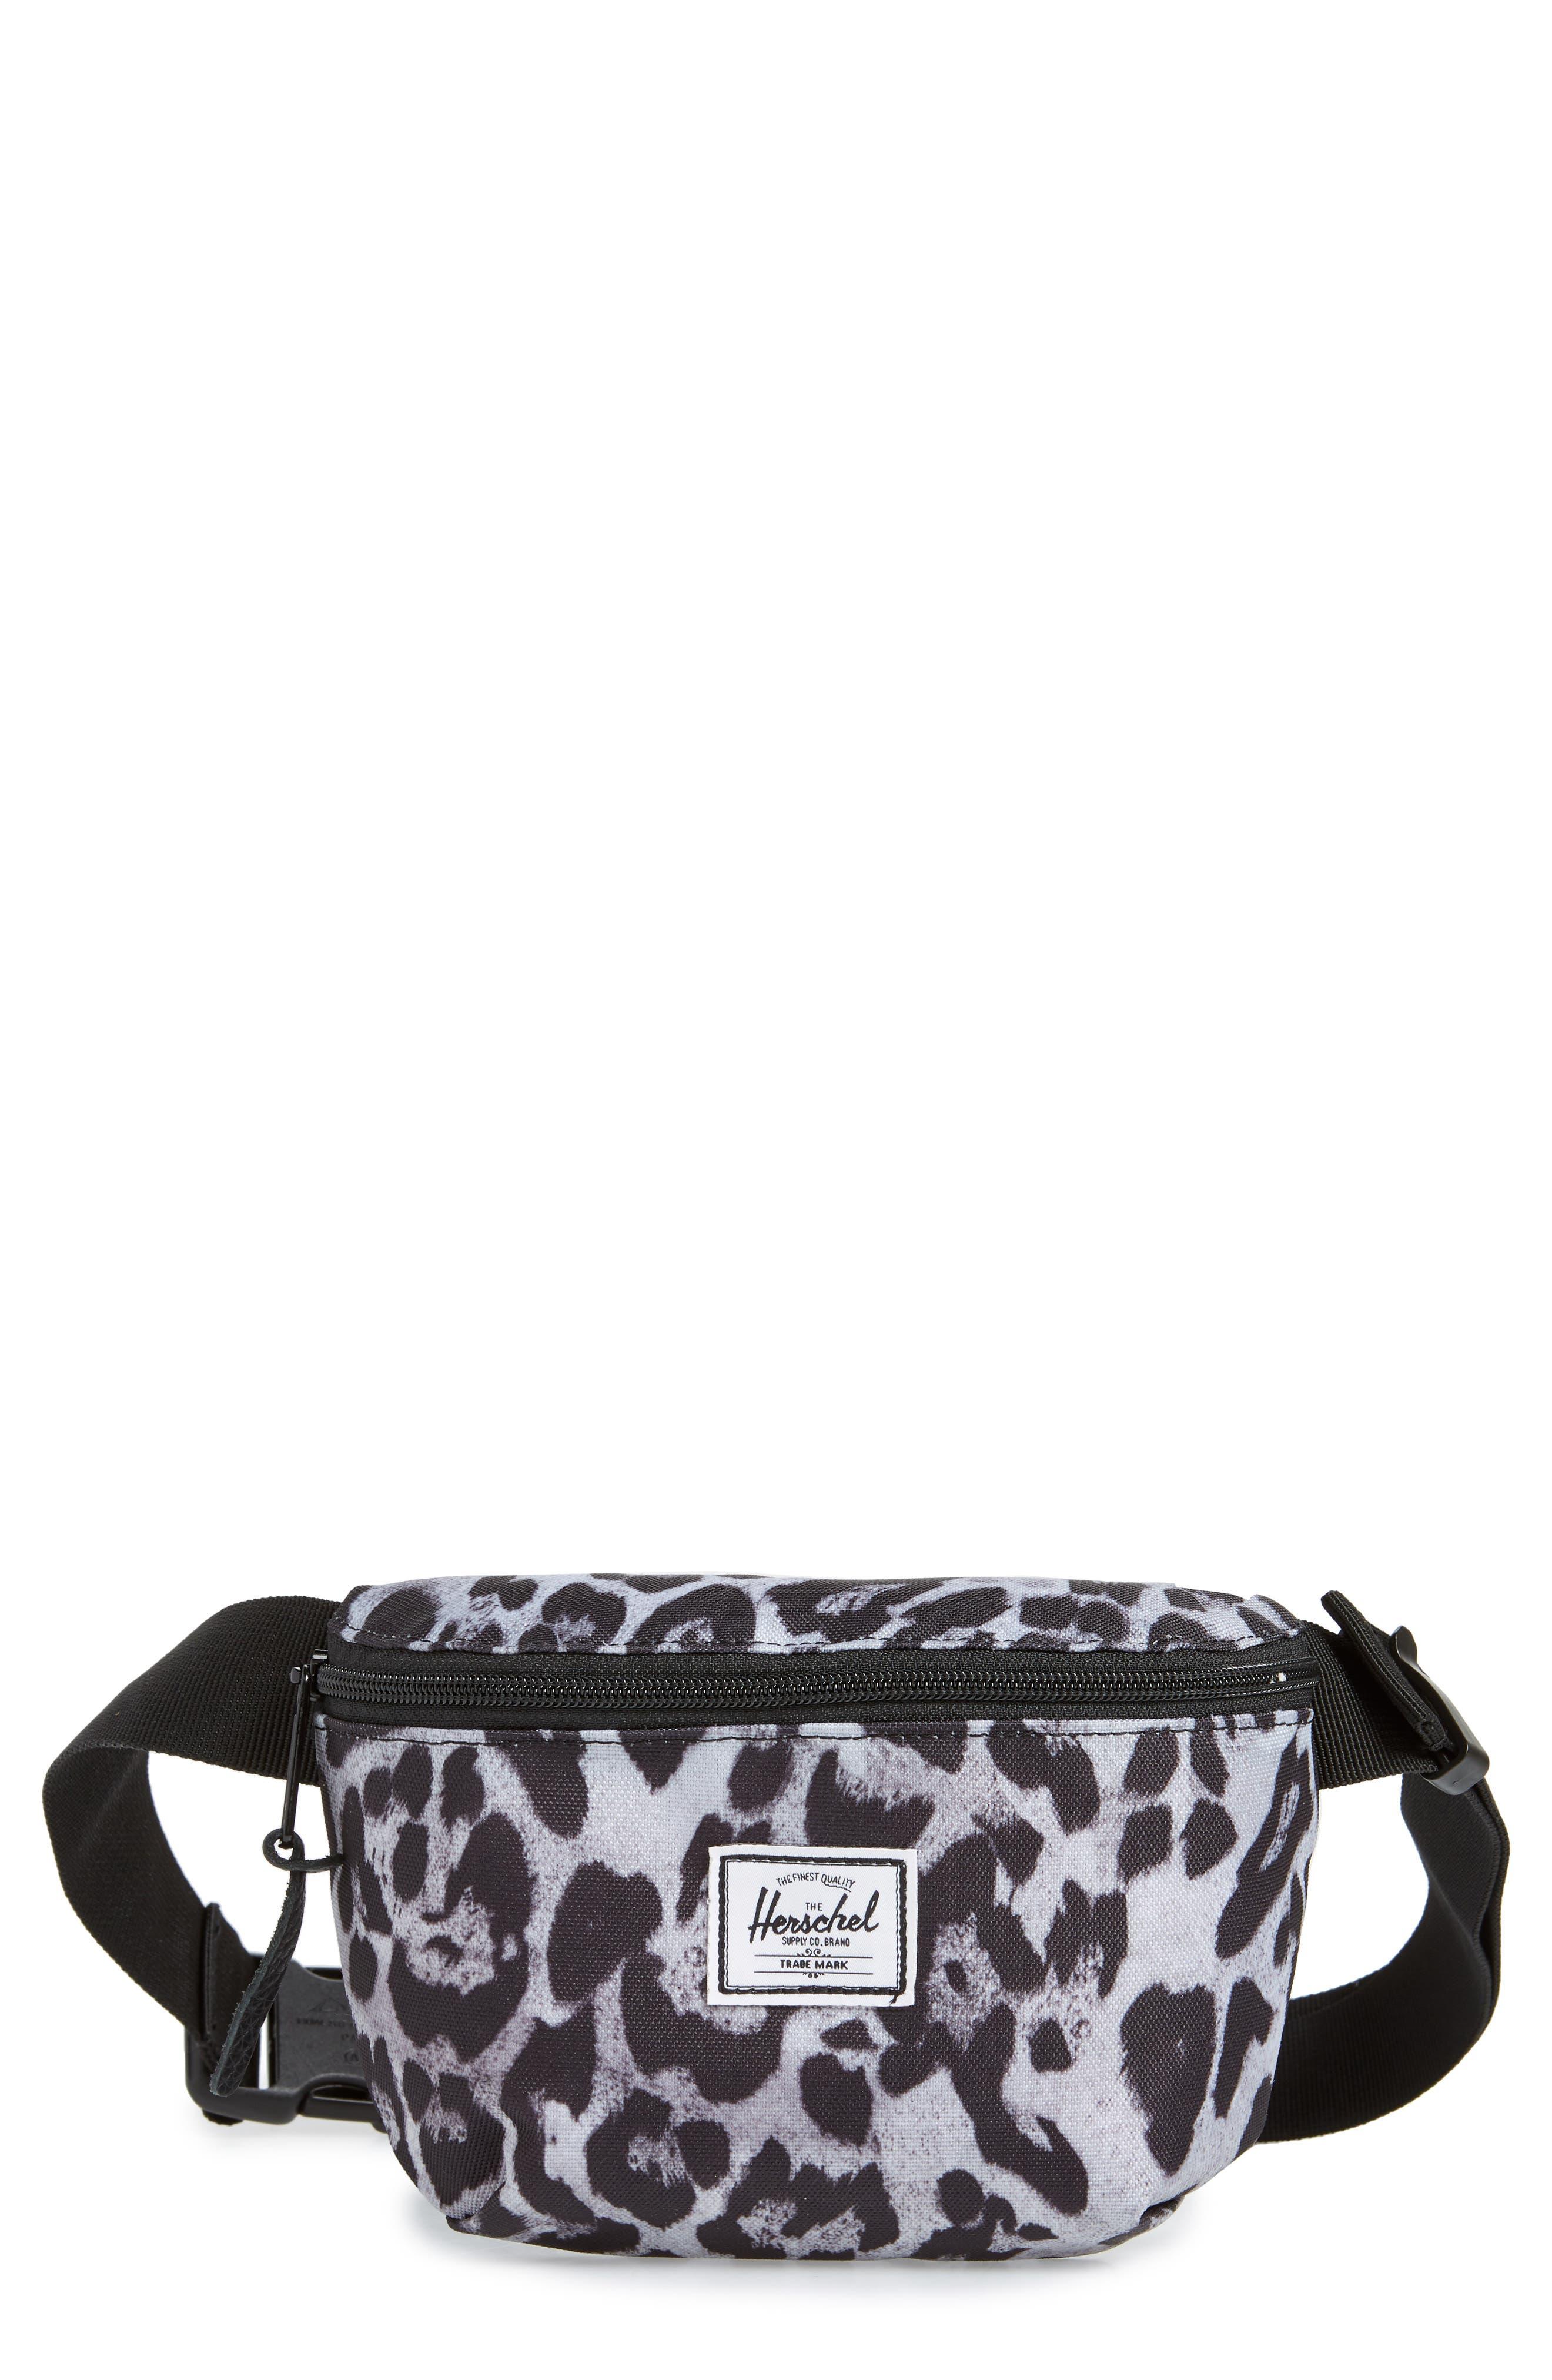 HERSCHEL SUPPLY CO. Herschel Fourteen Snow Leopard Belt Bag in Black Crosshatch